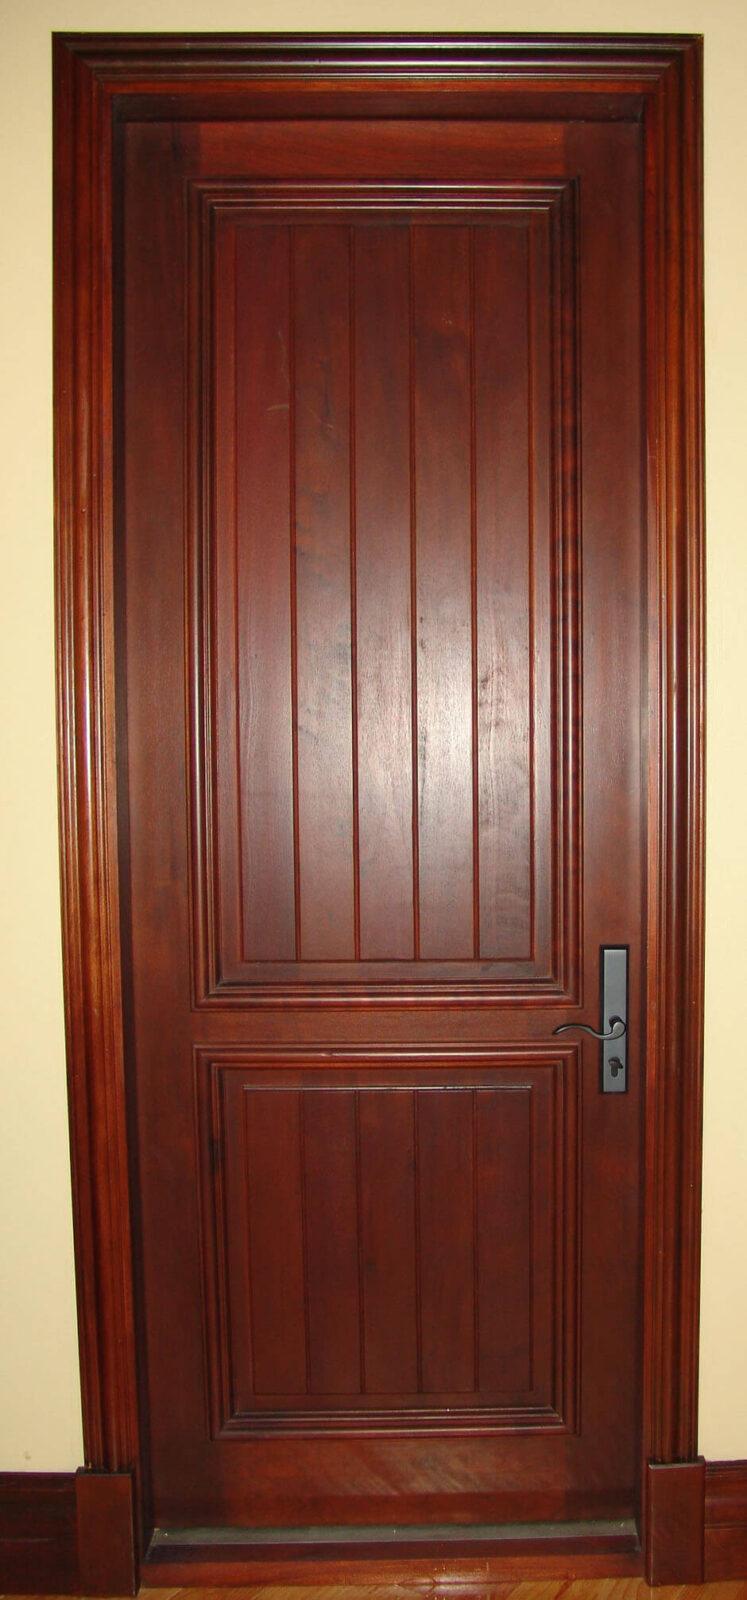 TROYA MAHOGANY DOOR.